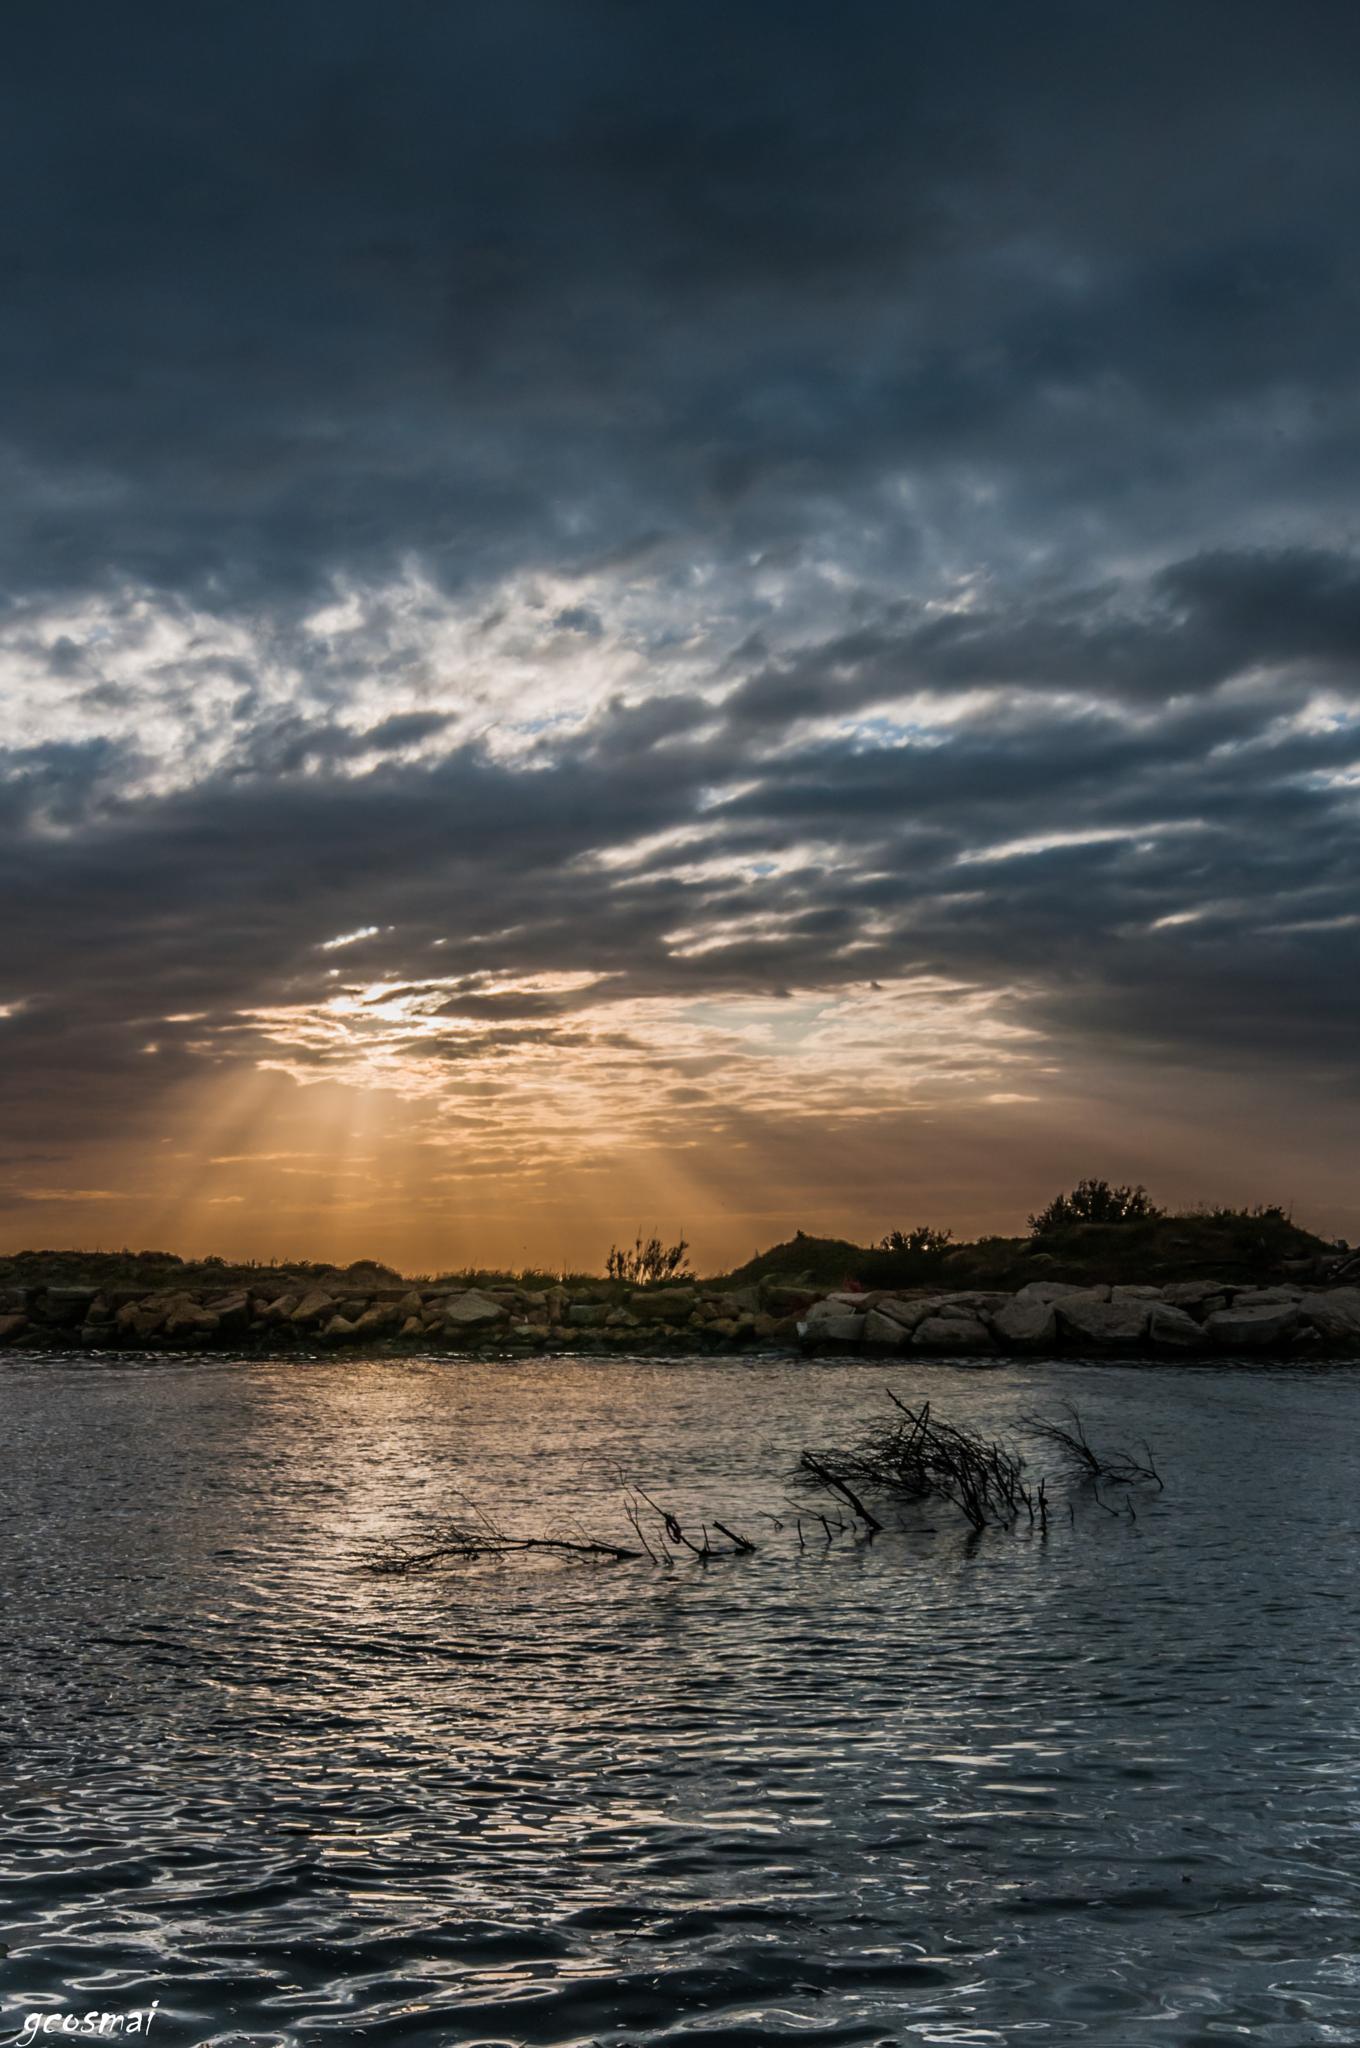 Sunset in Tuscia by G.Cosmai